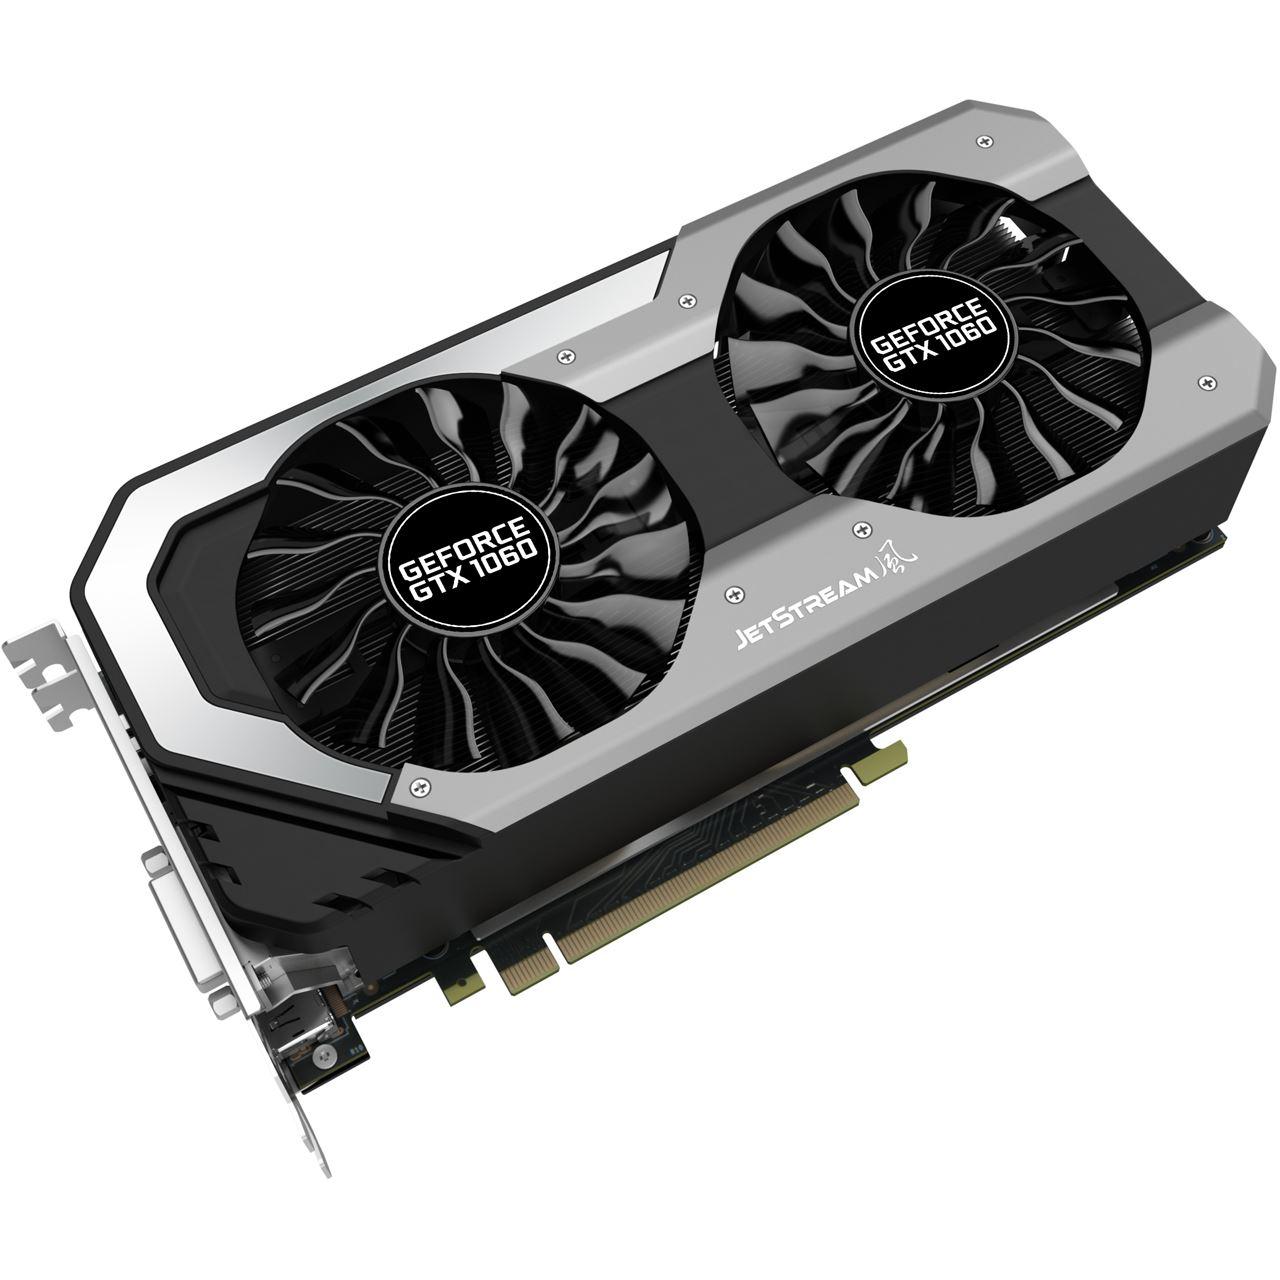 Palit GeForce GTX 1060 Super JetStream Grafikkarte 6GB